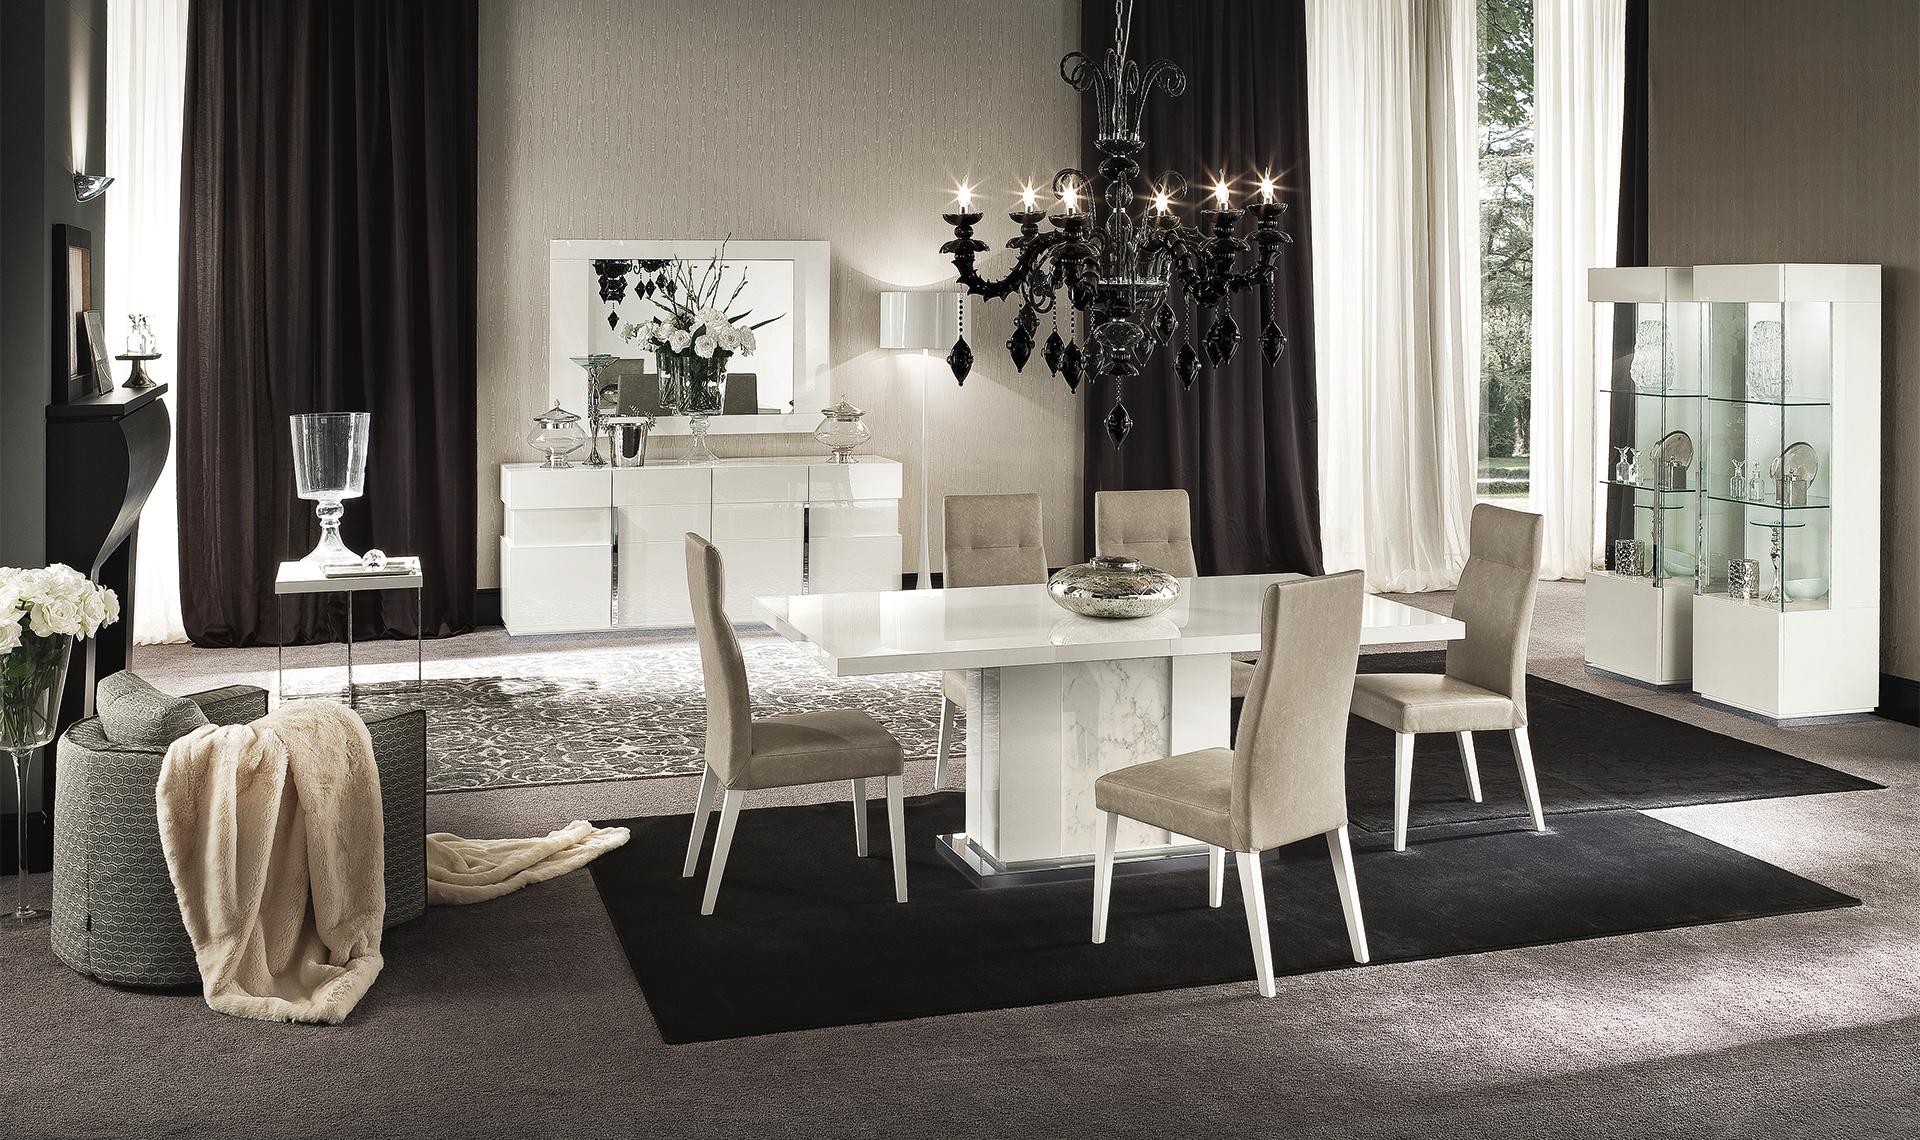 Canova Dining Room 3